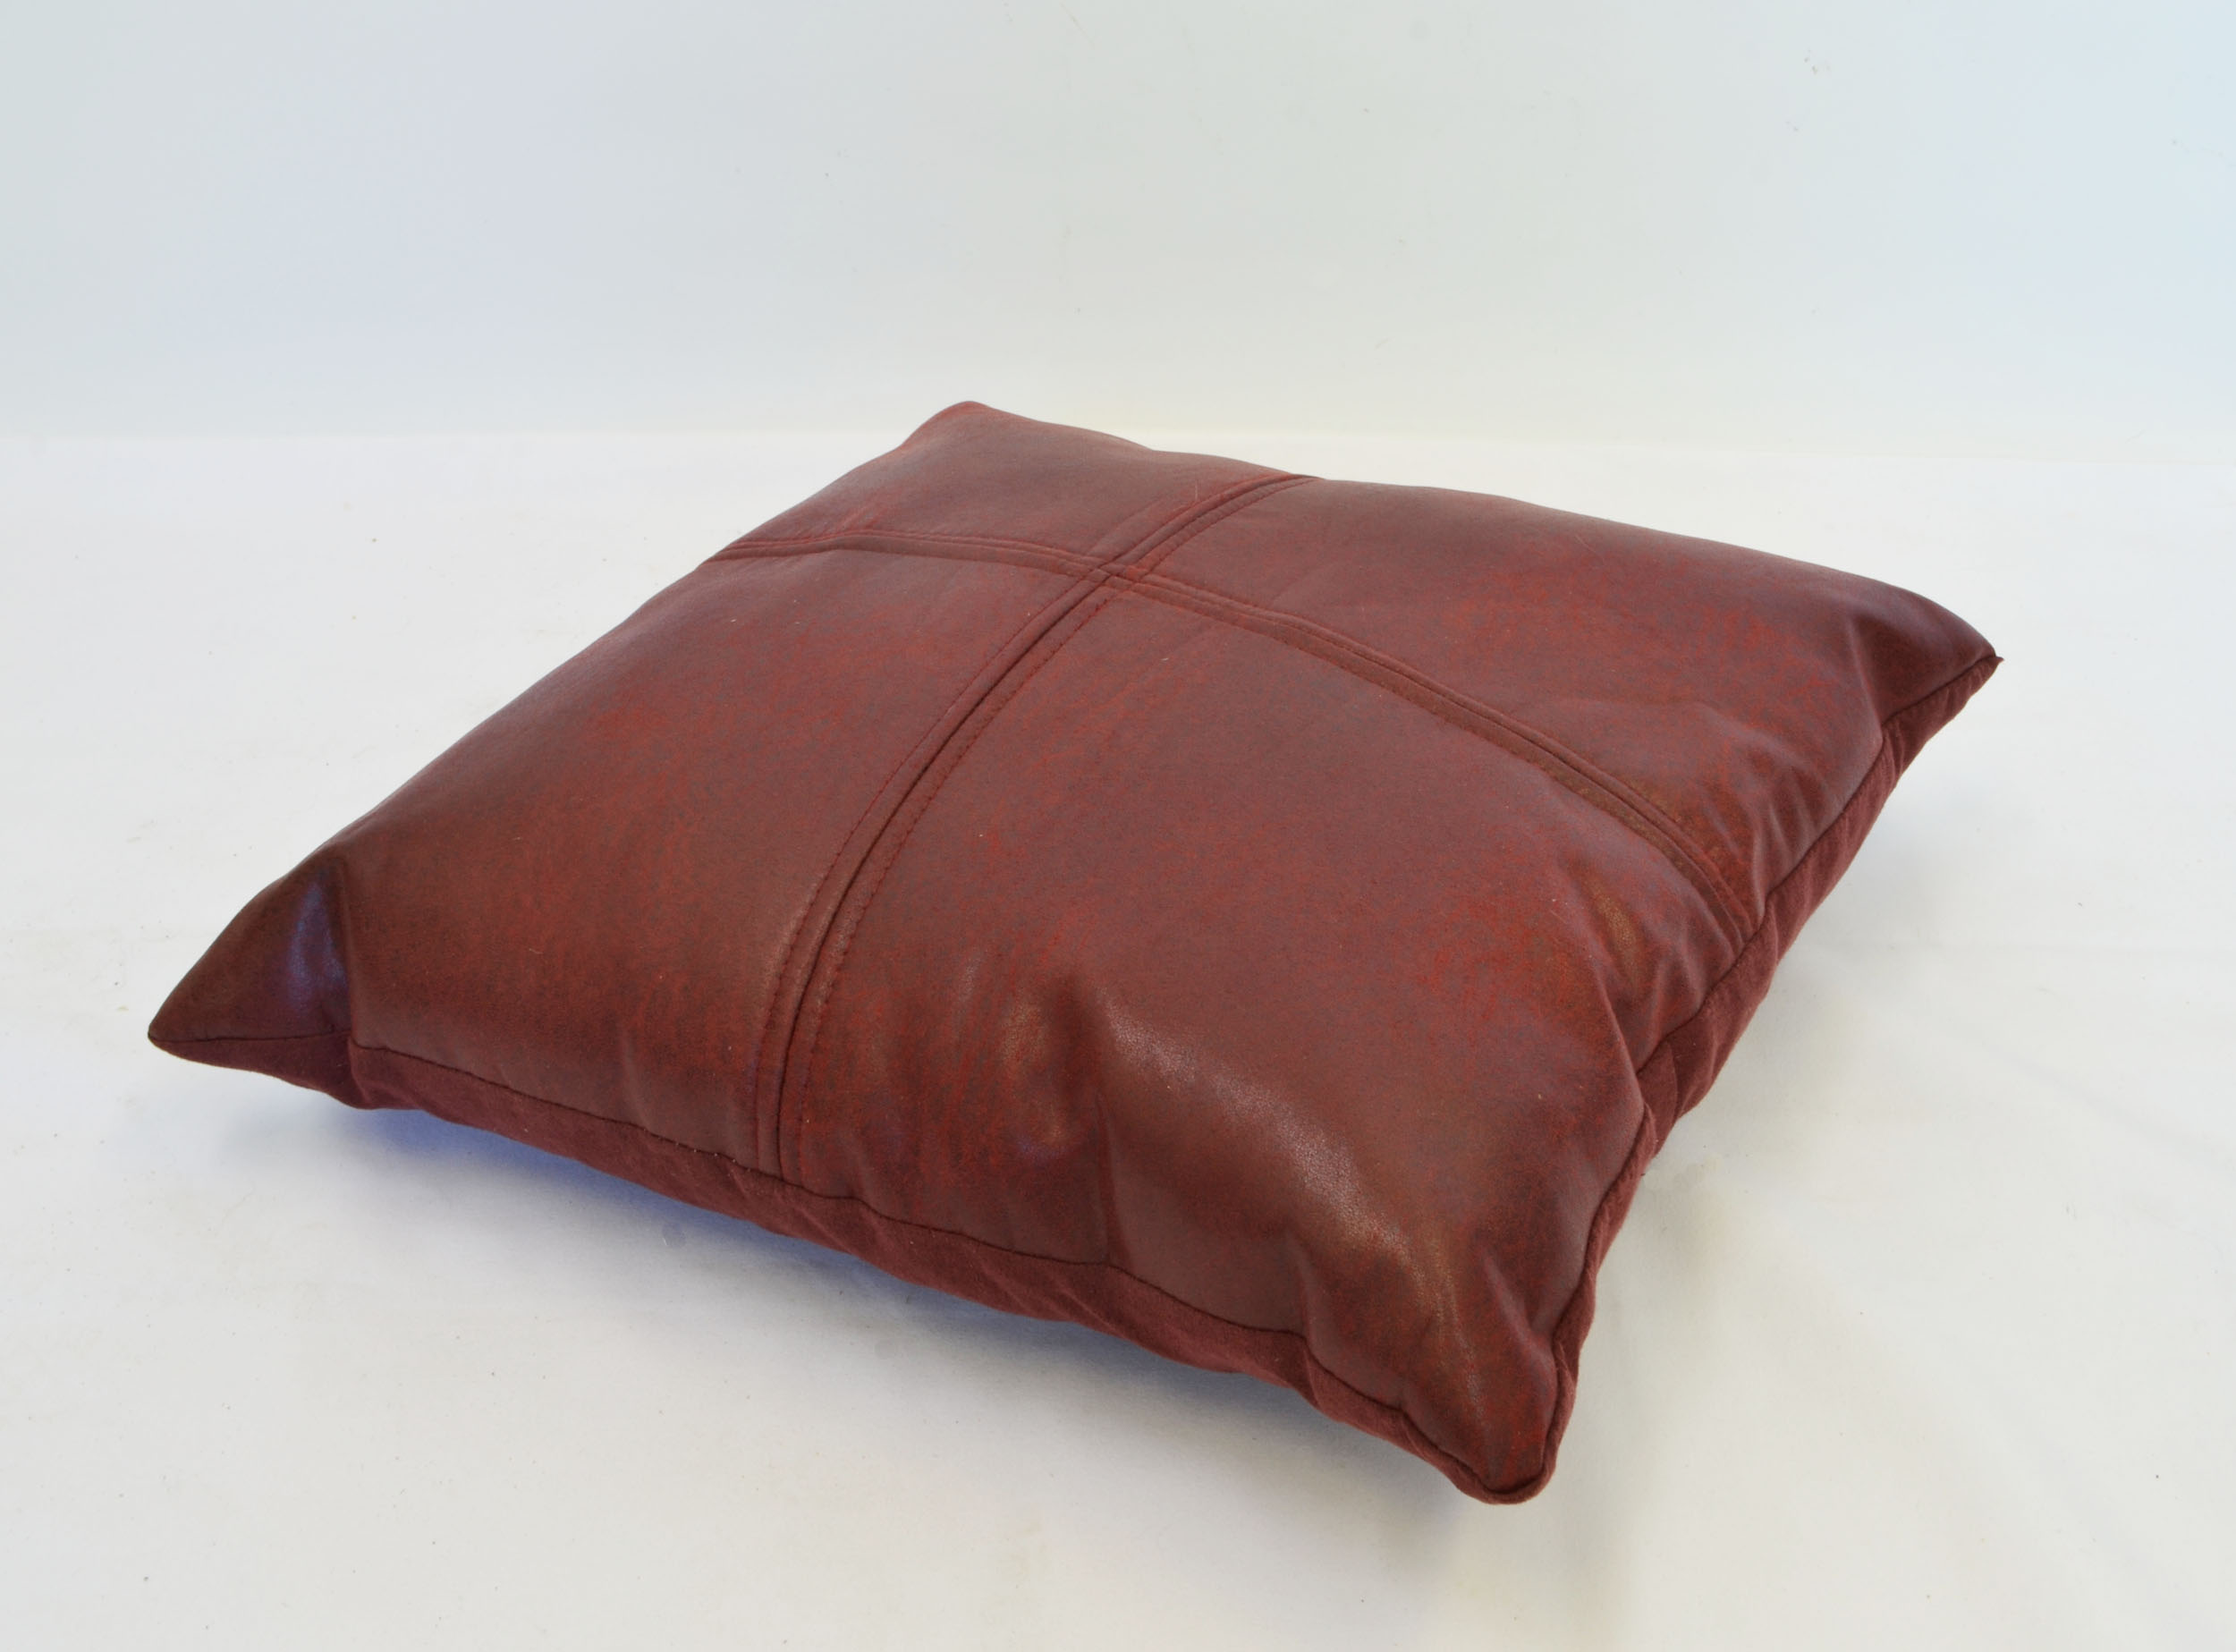 burgundy pillow   Quantity: 1  Price: $10.00